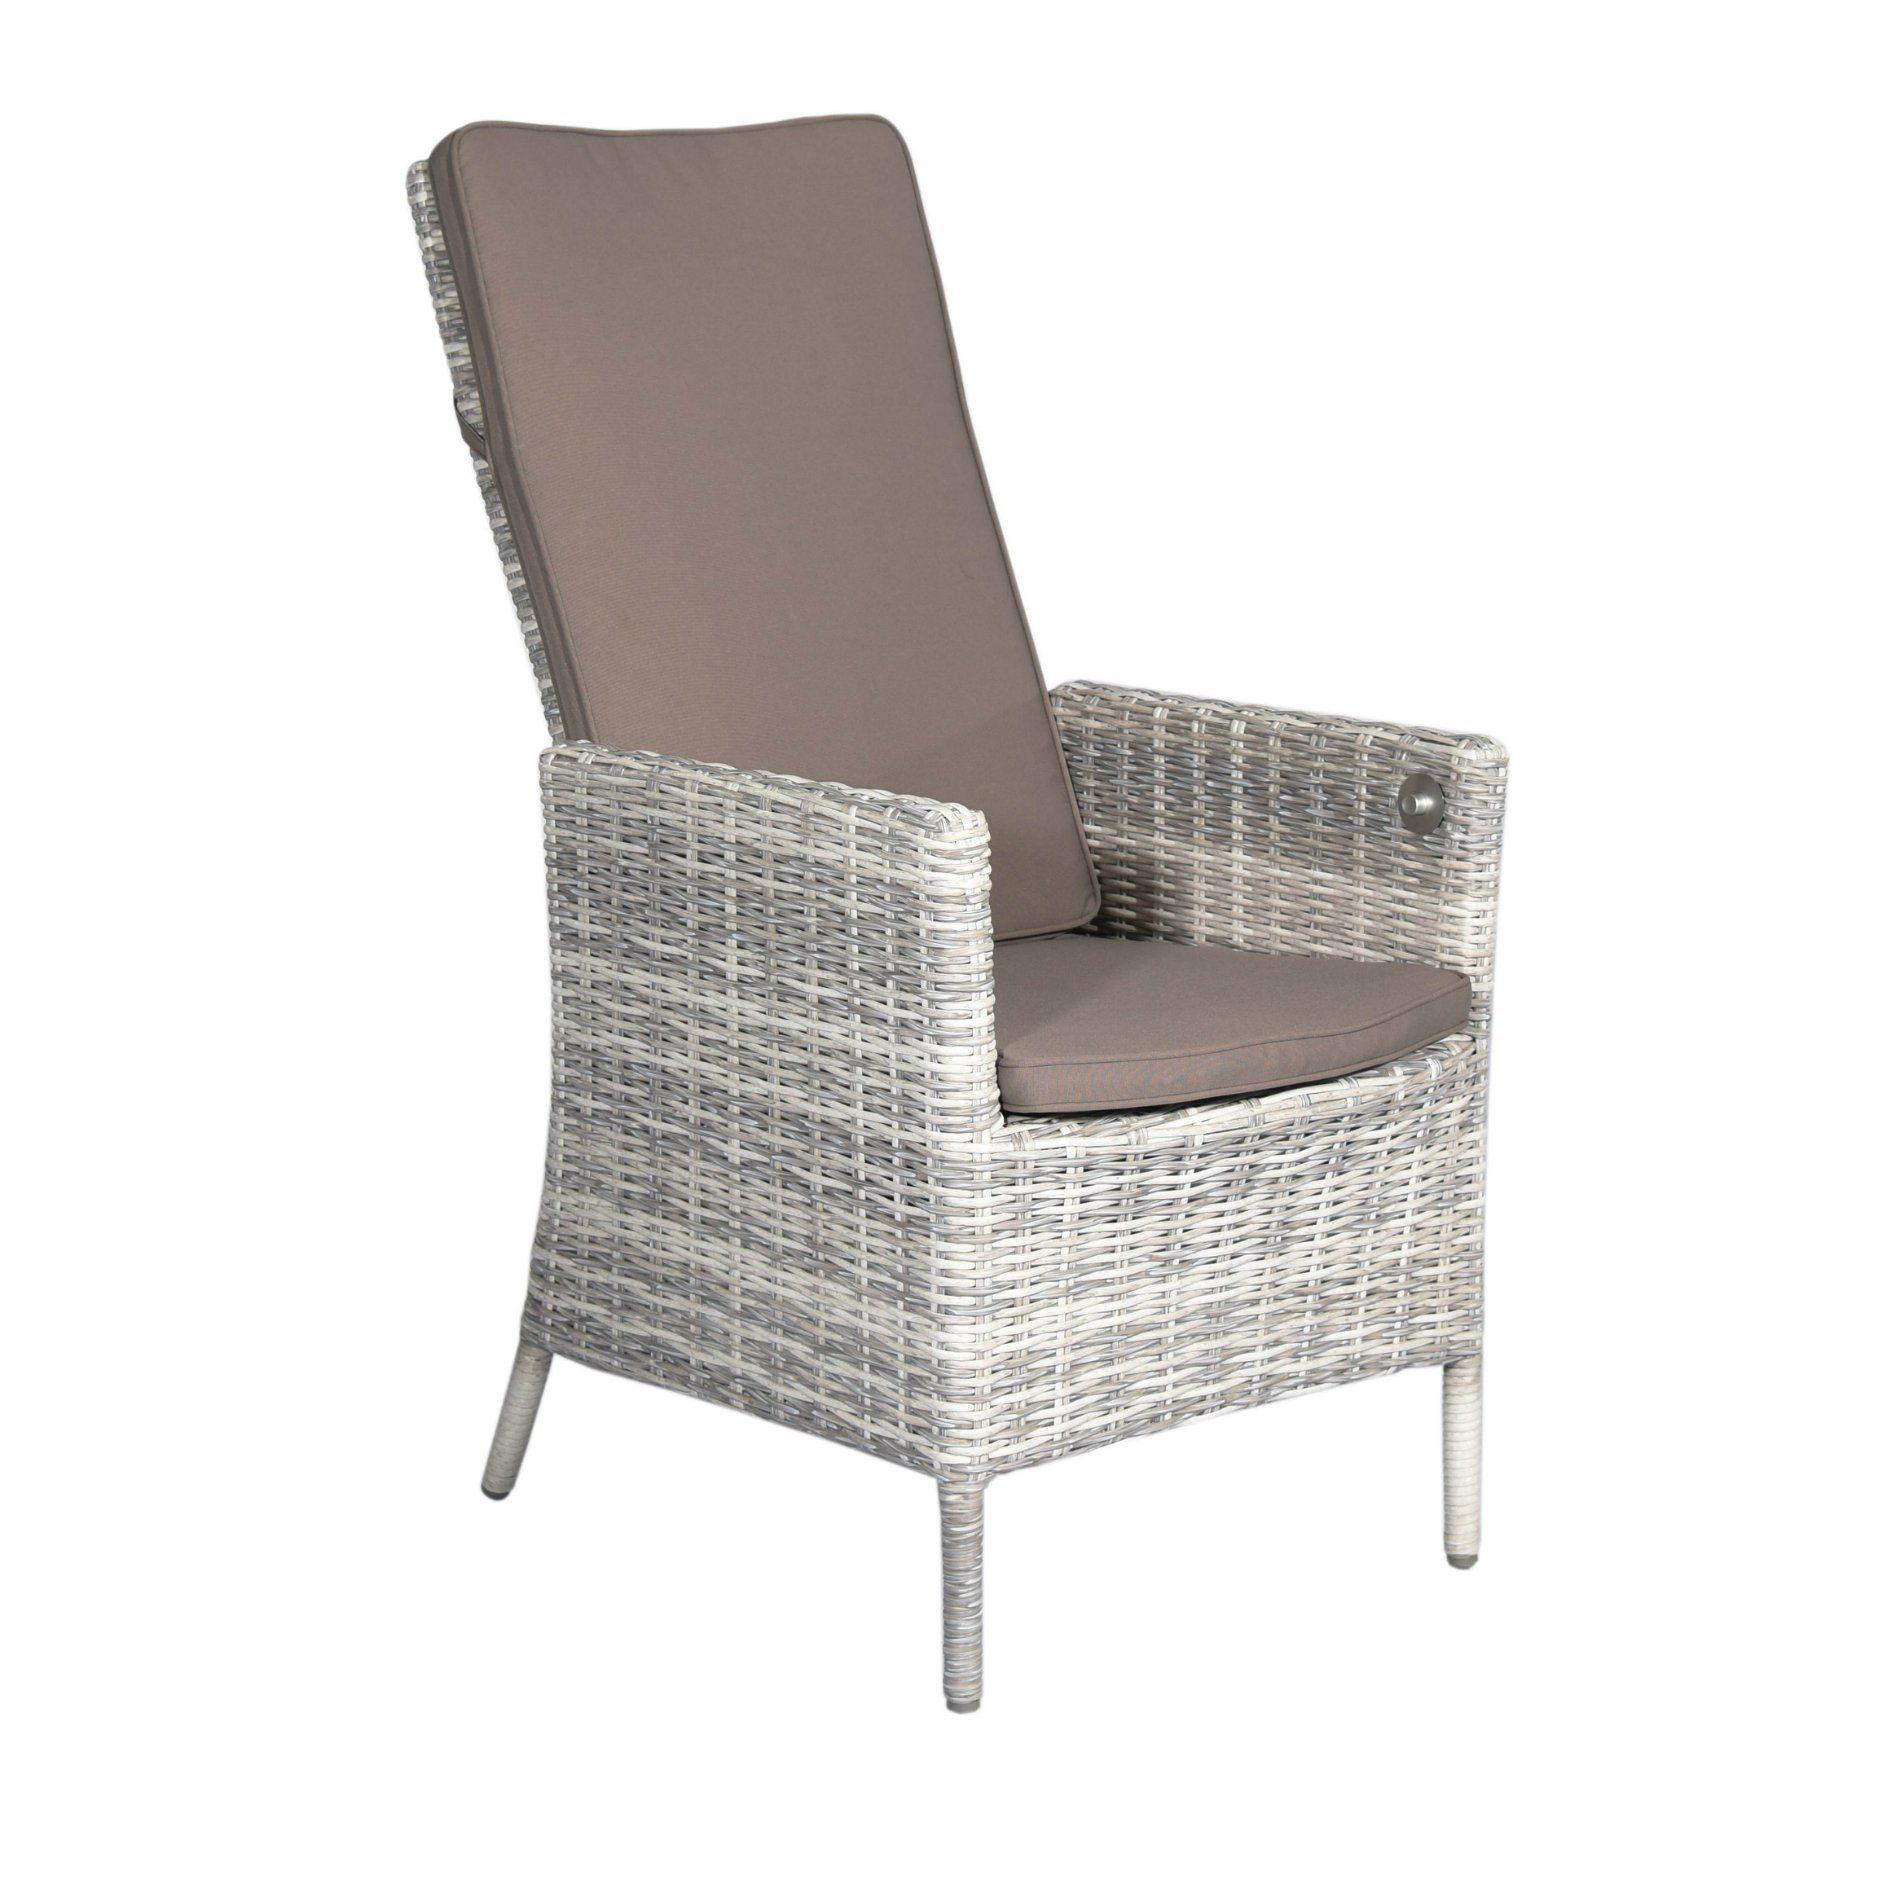 "Home Islands ""Phuket"" Relax Dining Chair, Gestell Aluminium,, Polyrattan Geflecht Salt/Pepper weiß mit grauem Verlauf"